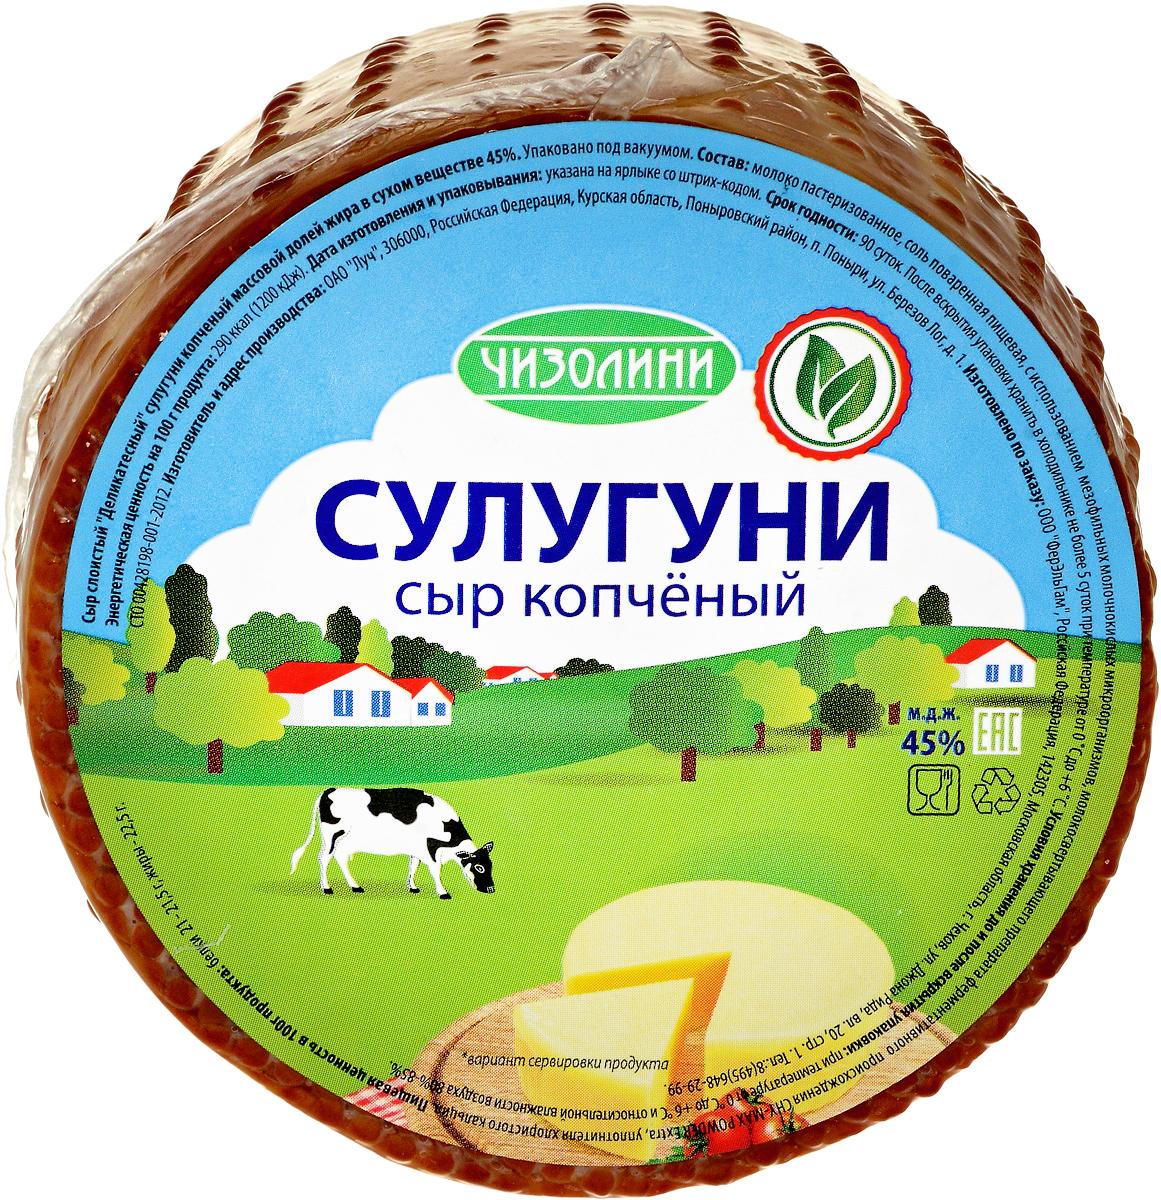 Чизолини Сыр Сулугуни, копченый, 250 г galbani сыр маскарпоне 80% 250 г